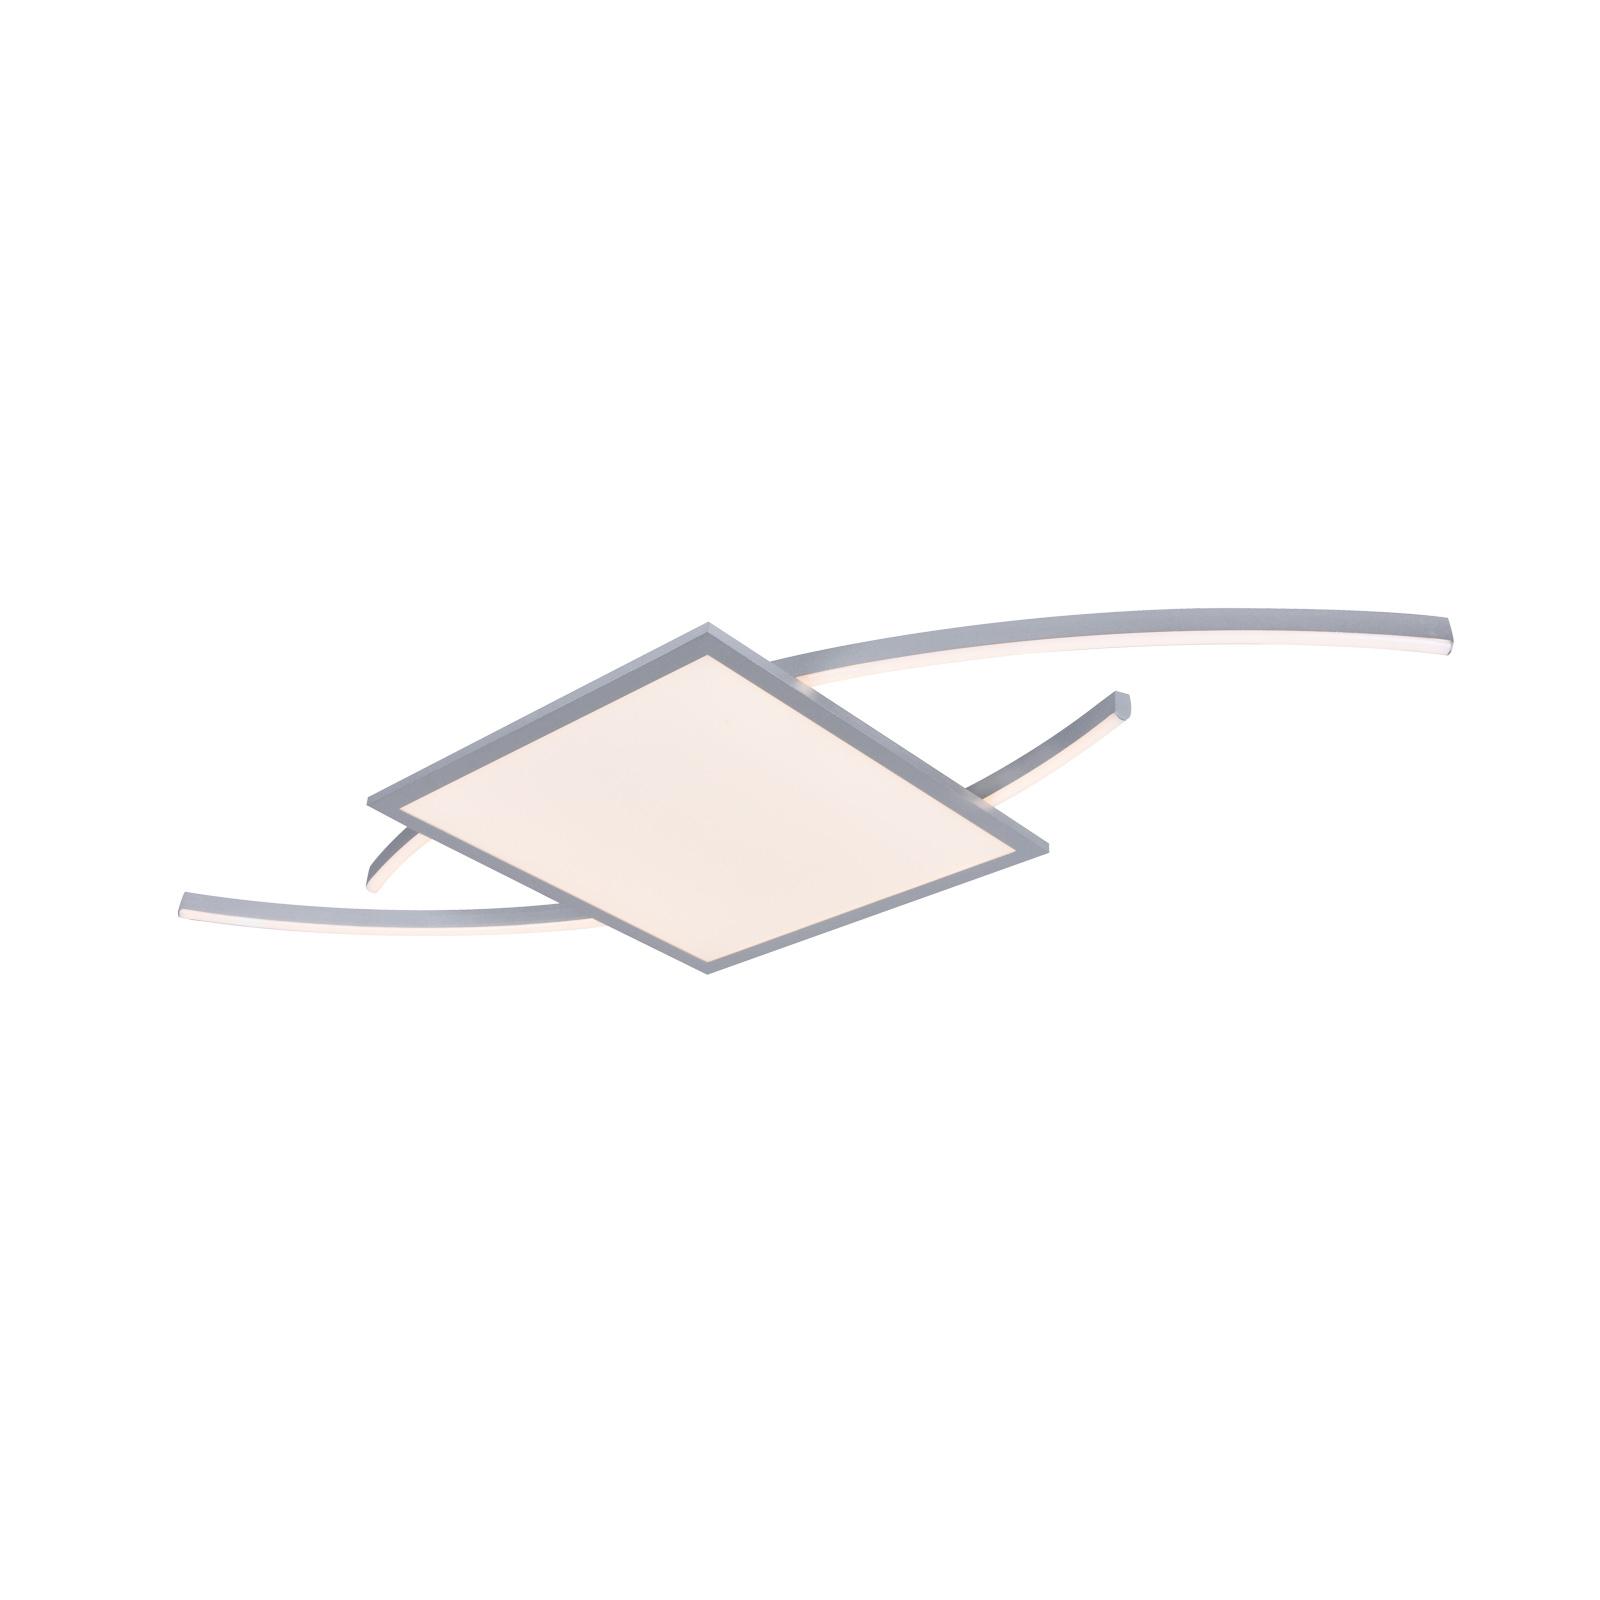 Lucande Tiaro LED plafondlamp, hoekig, 30 cm